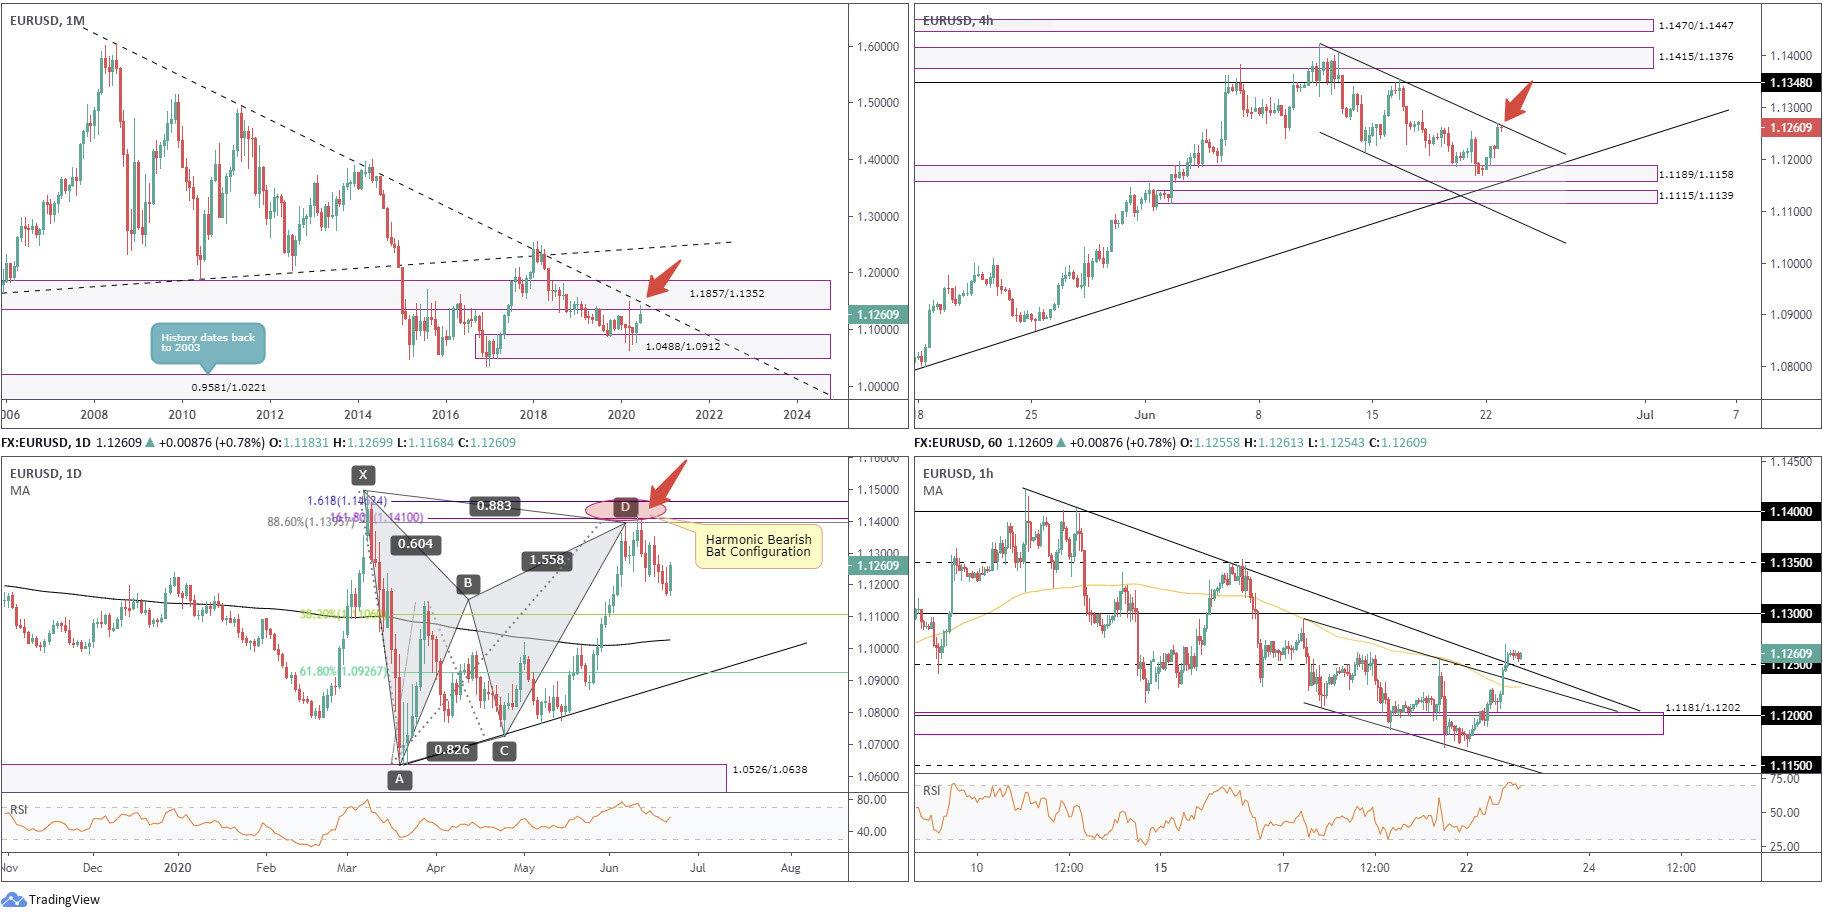 June 23rd 2020: Dollar Snaps 4-Day Winning Streak as Risk Sentiment Improves, FP Markets